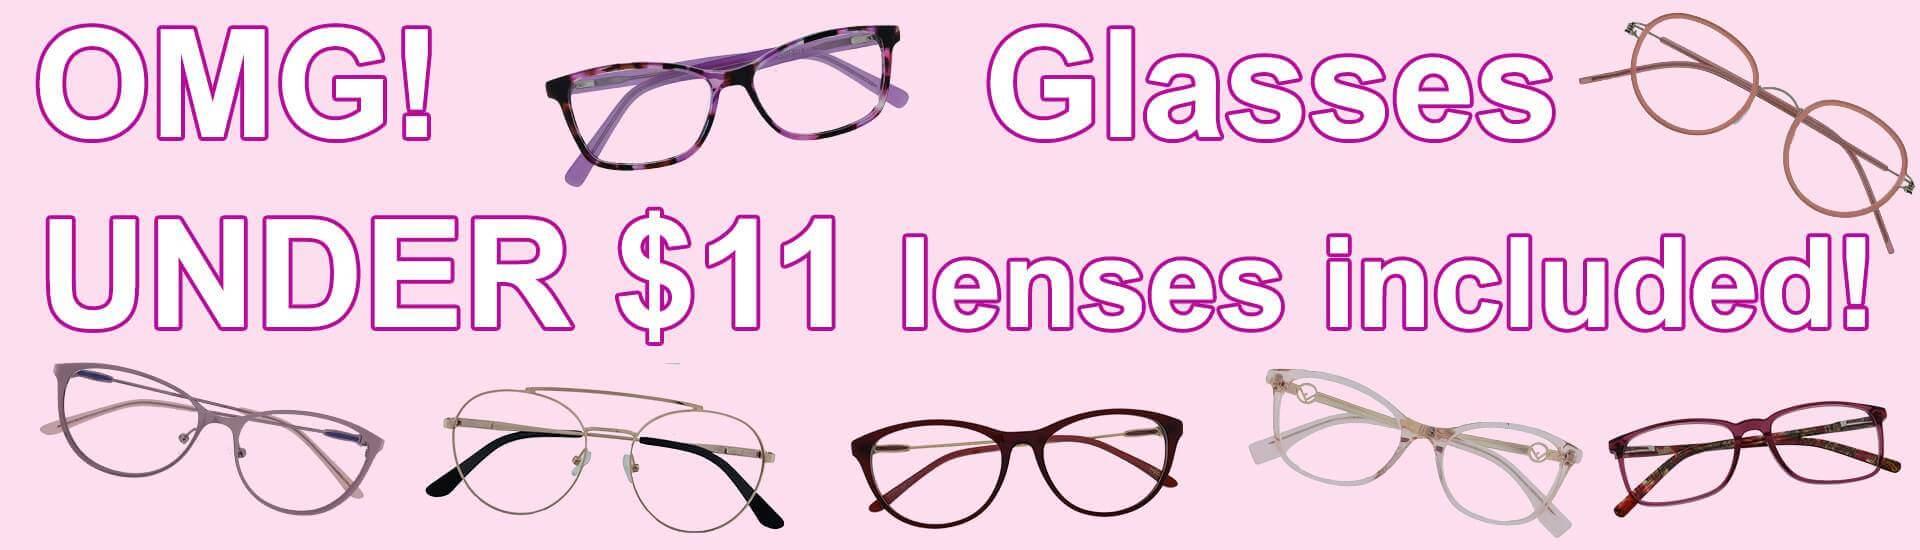 OMG! Glasses under $11 lenses included